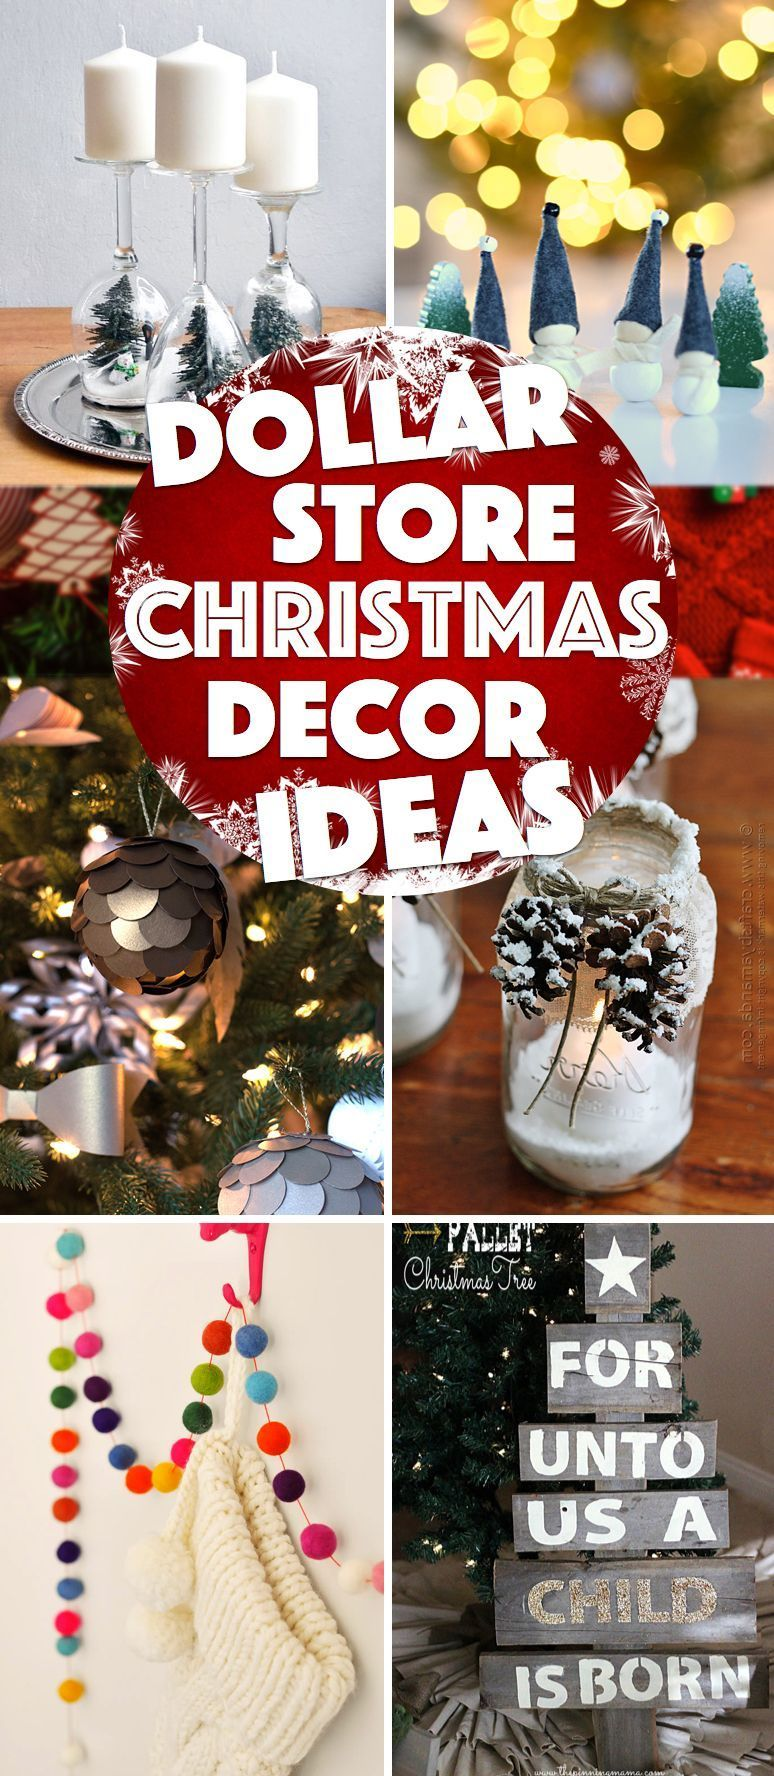 39 Oh So Gorgeous Dollar Store Diy Christmas Decor Ideas To Make You Scream With Jo Diy Christmas Decorations Dollar Store Dollar Store Christmas Christmas Diy